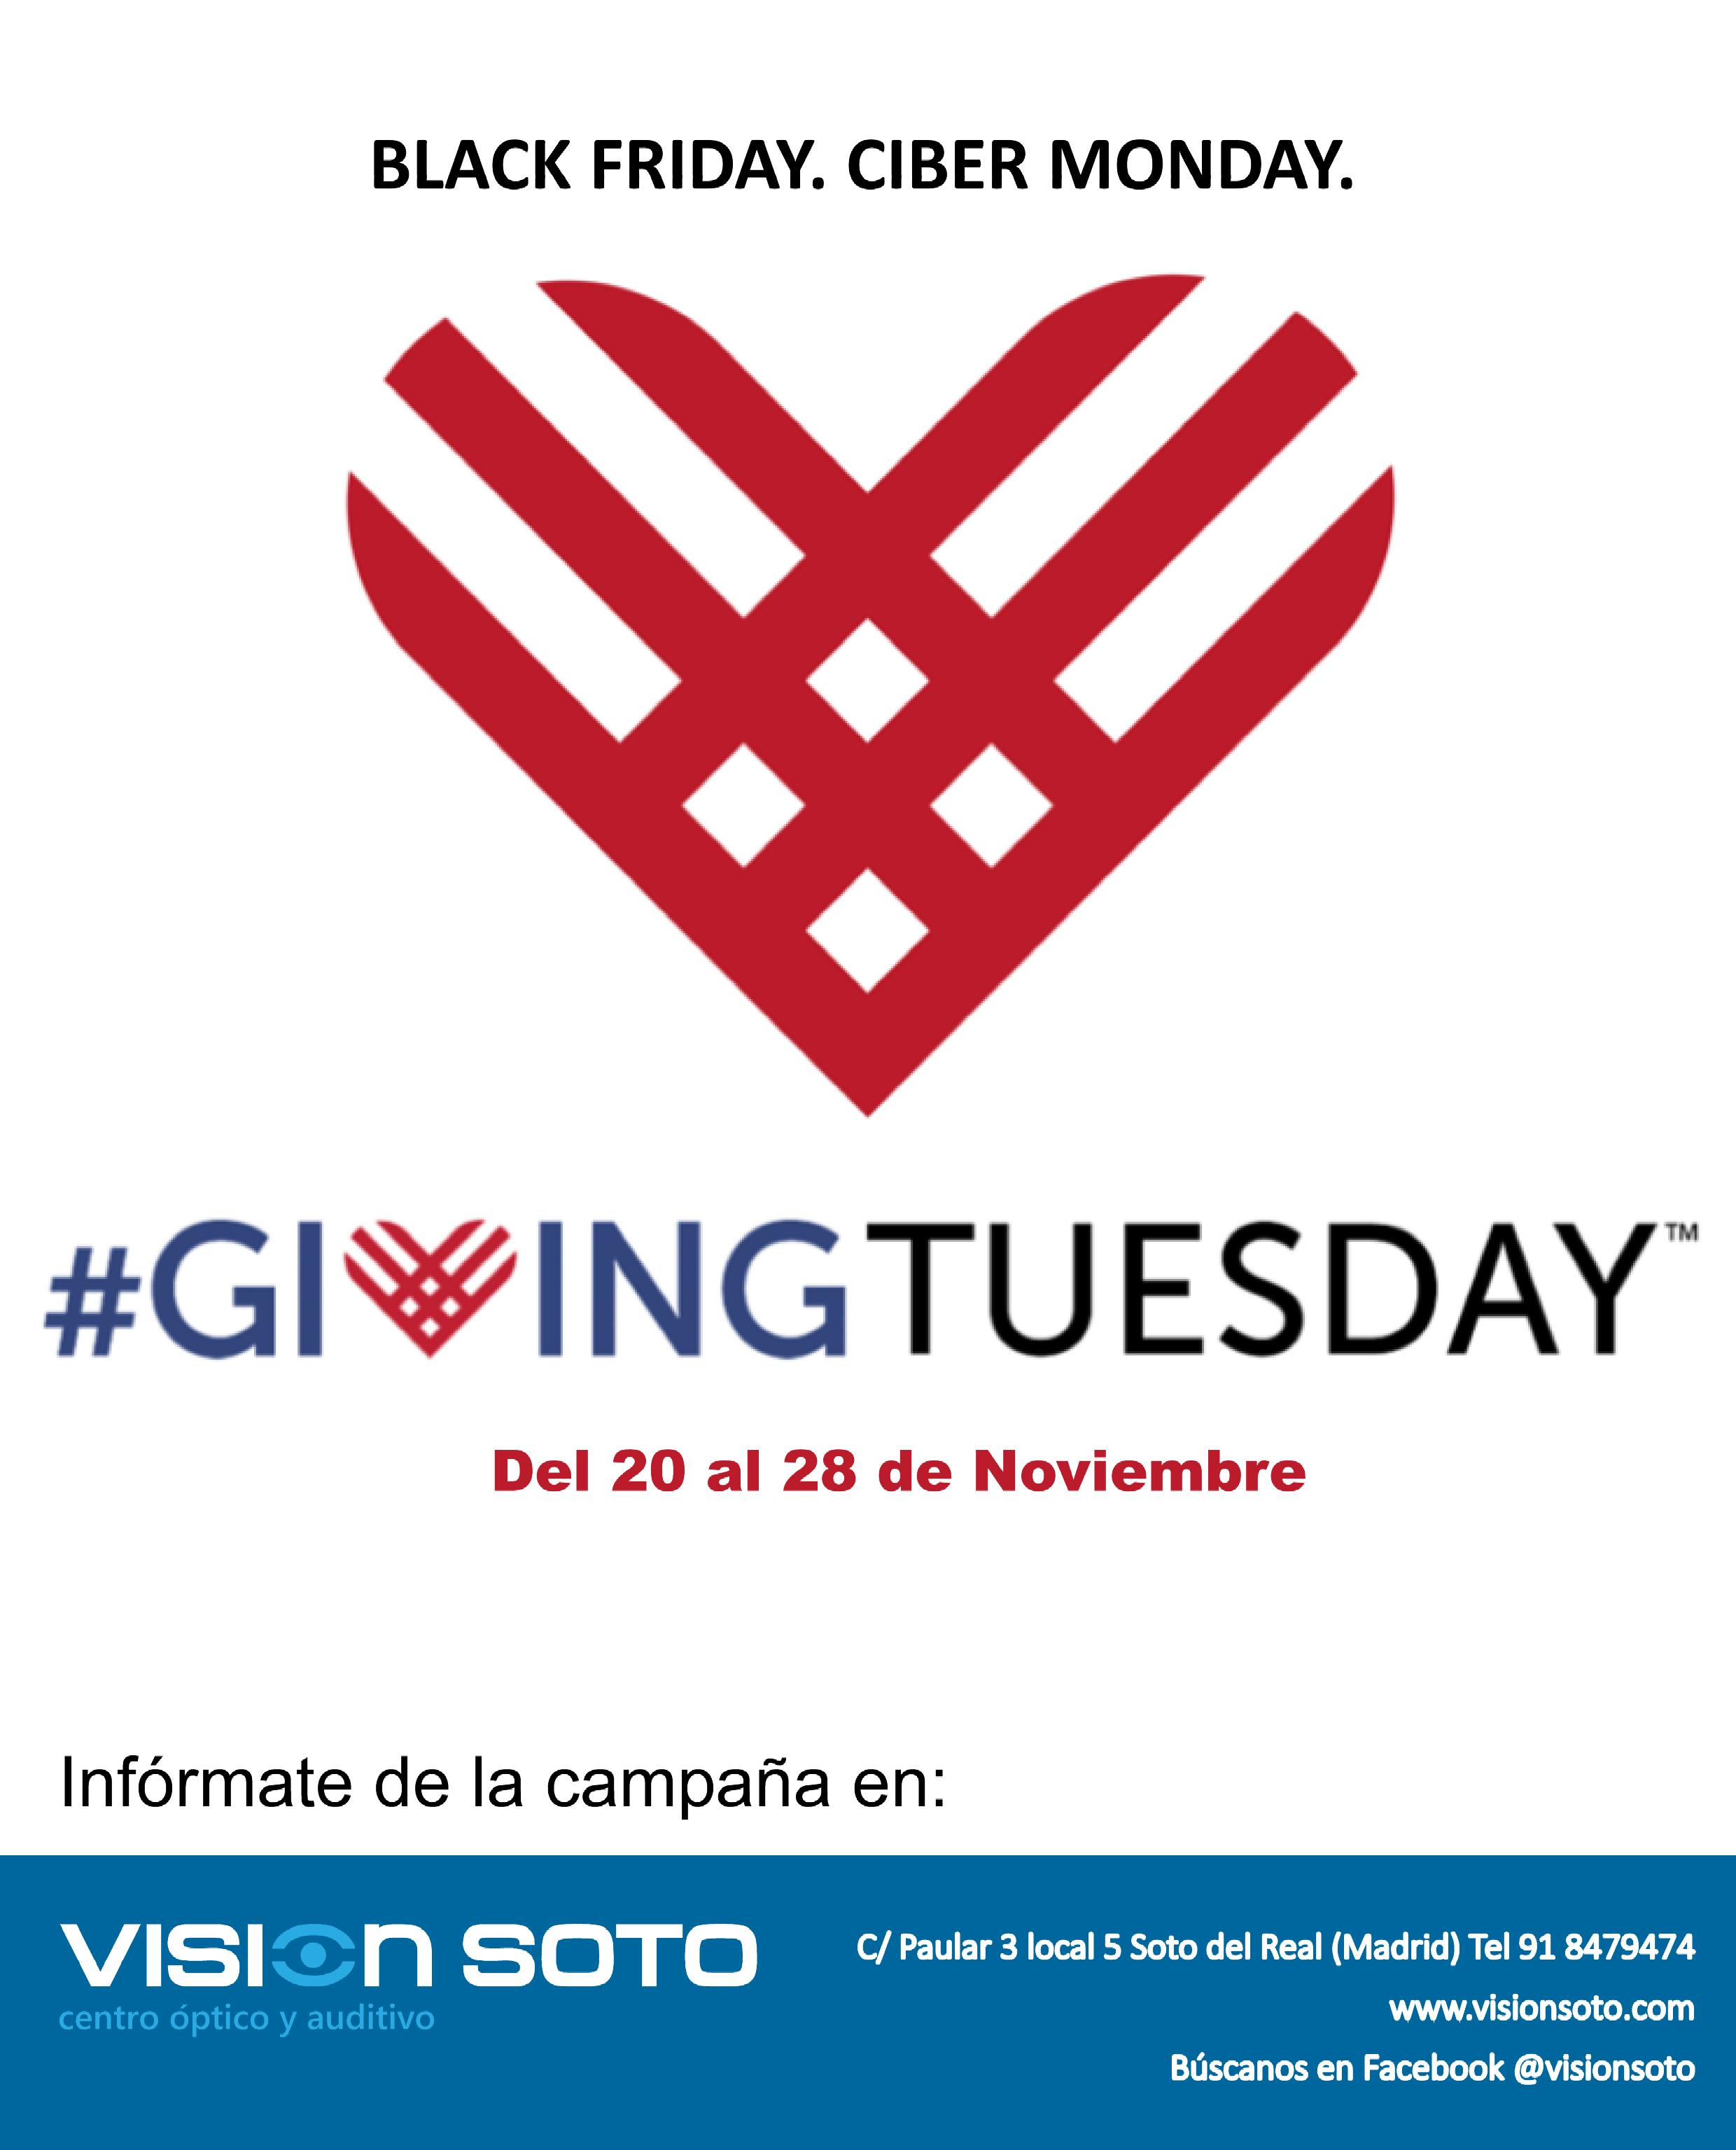 Visión Soto centro óptico y auditivo celebra #GIVINGTUESDAY.